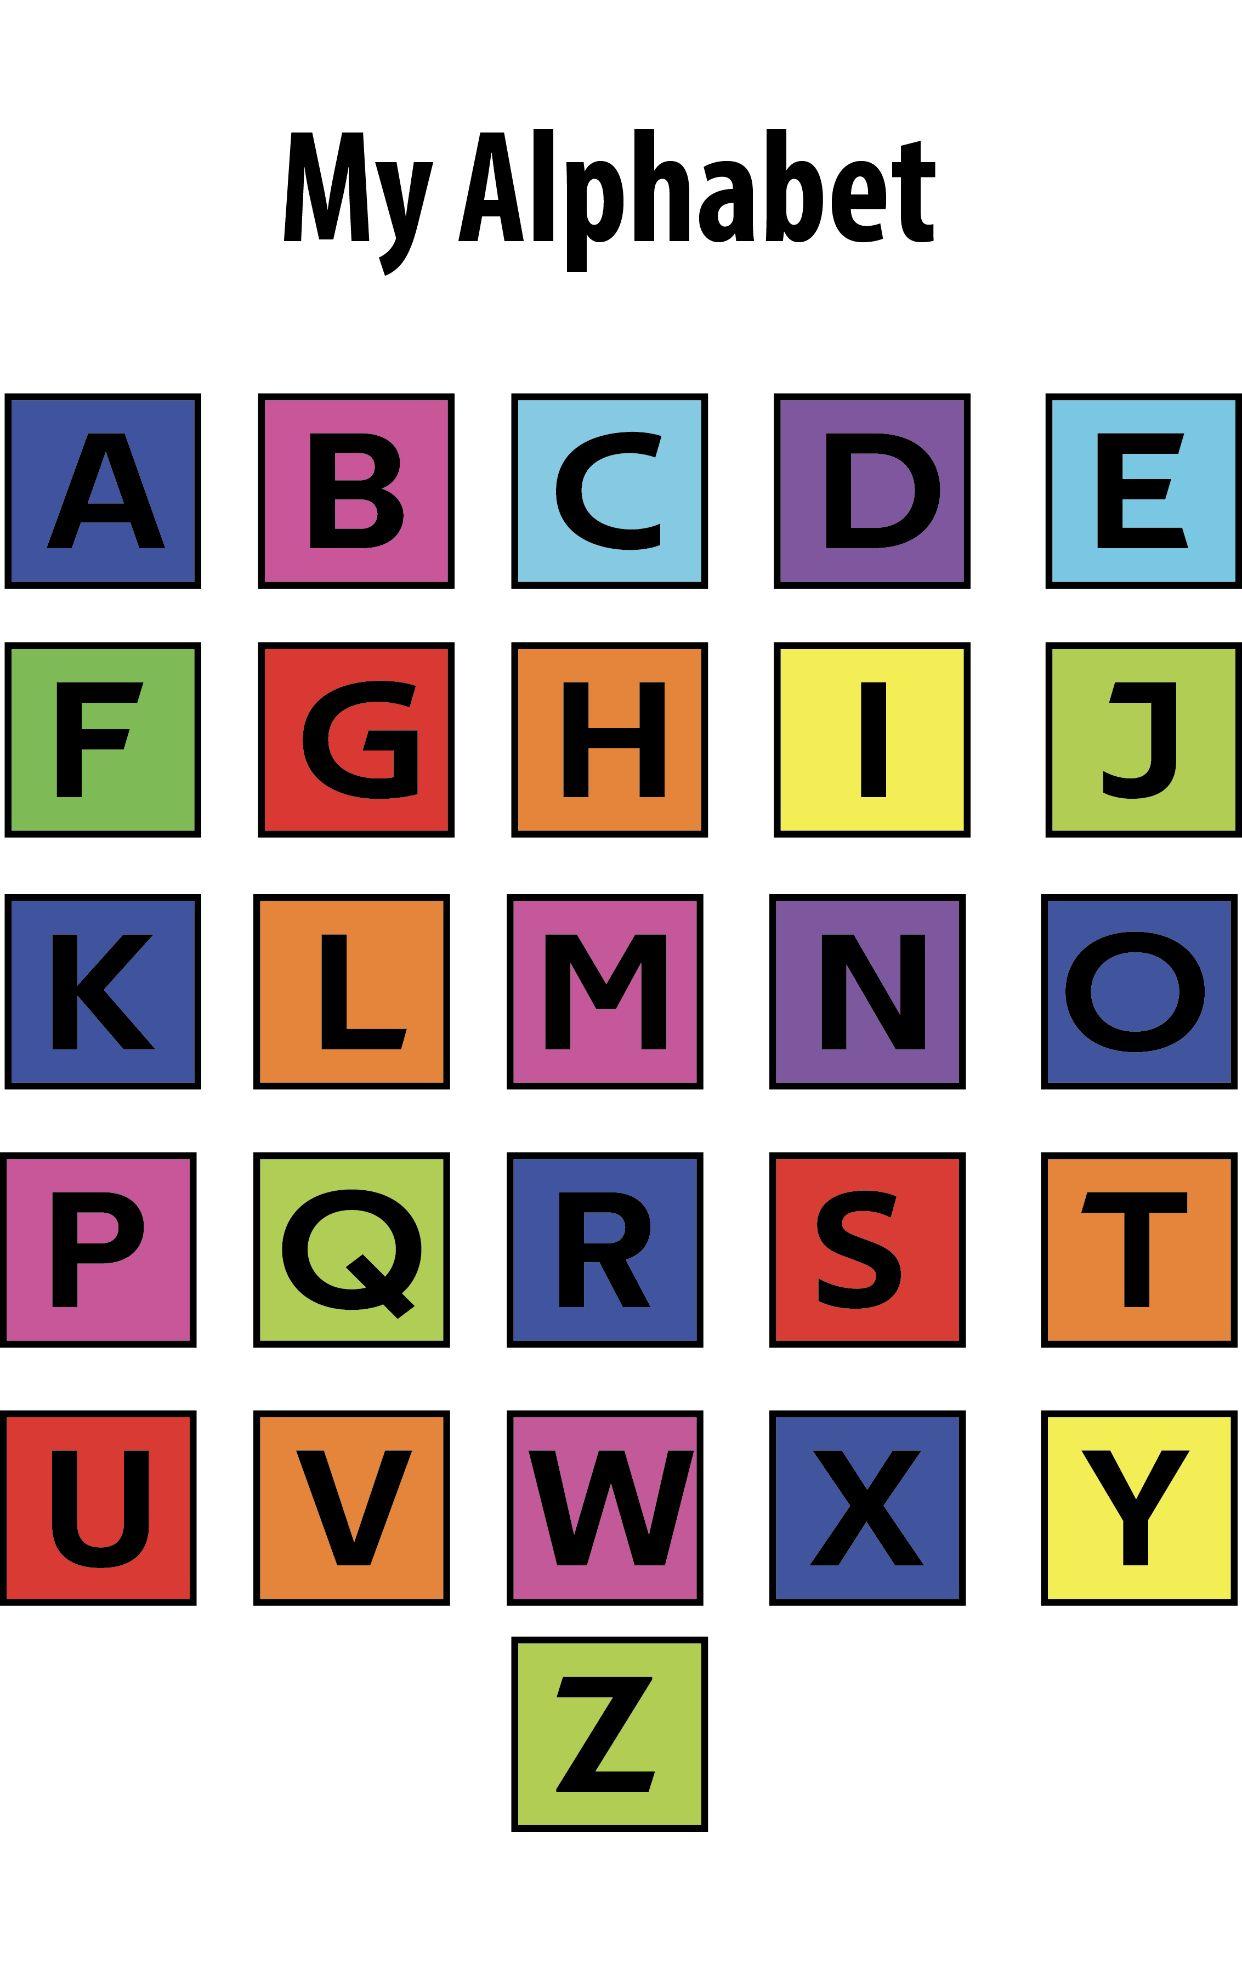 Free Abc Poster Alphabet Worksheets Free Alphabet Worksheets Preschool Abc Worksheets